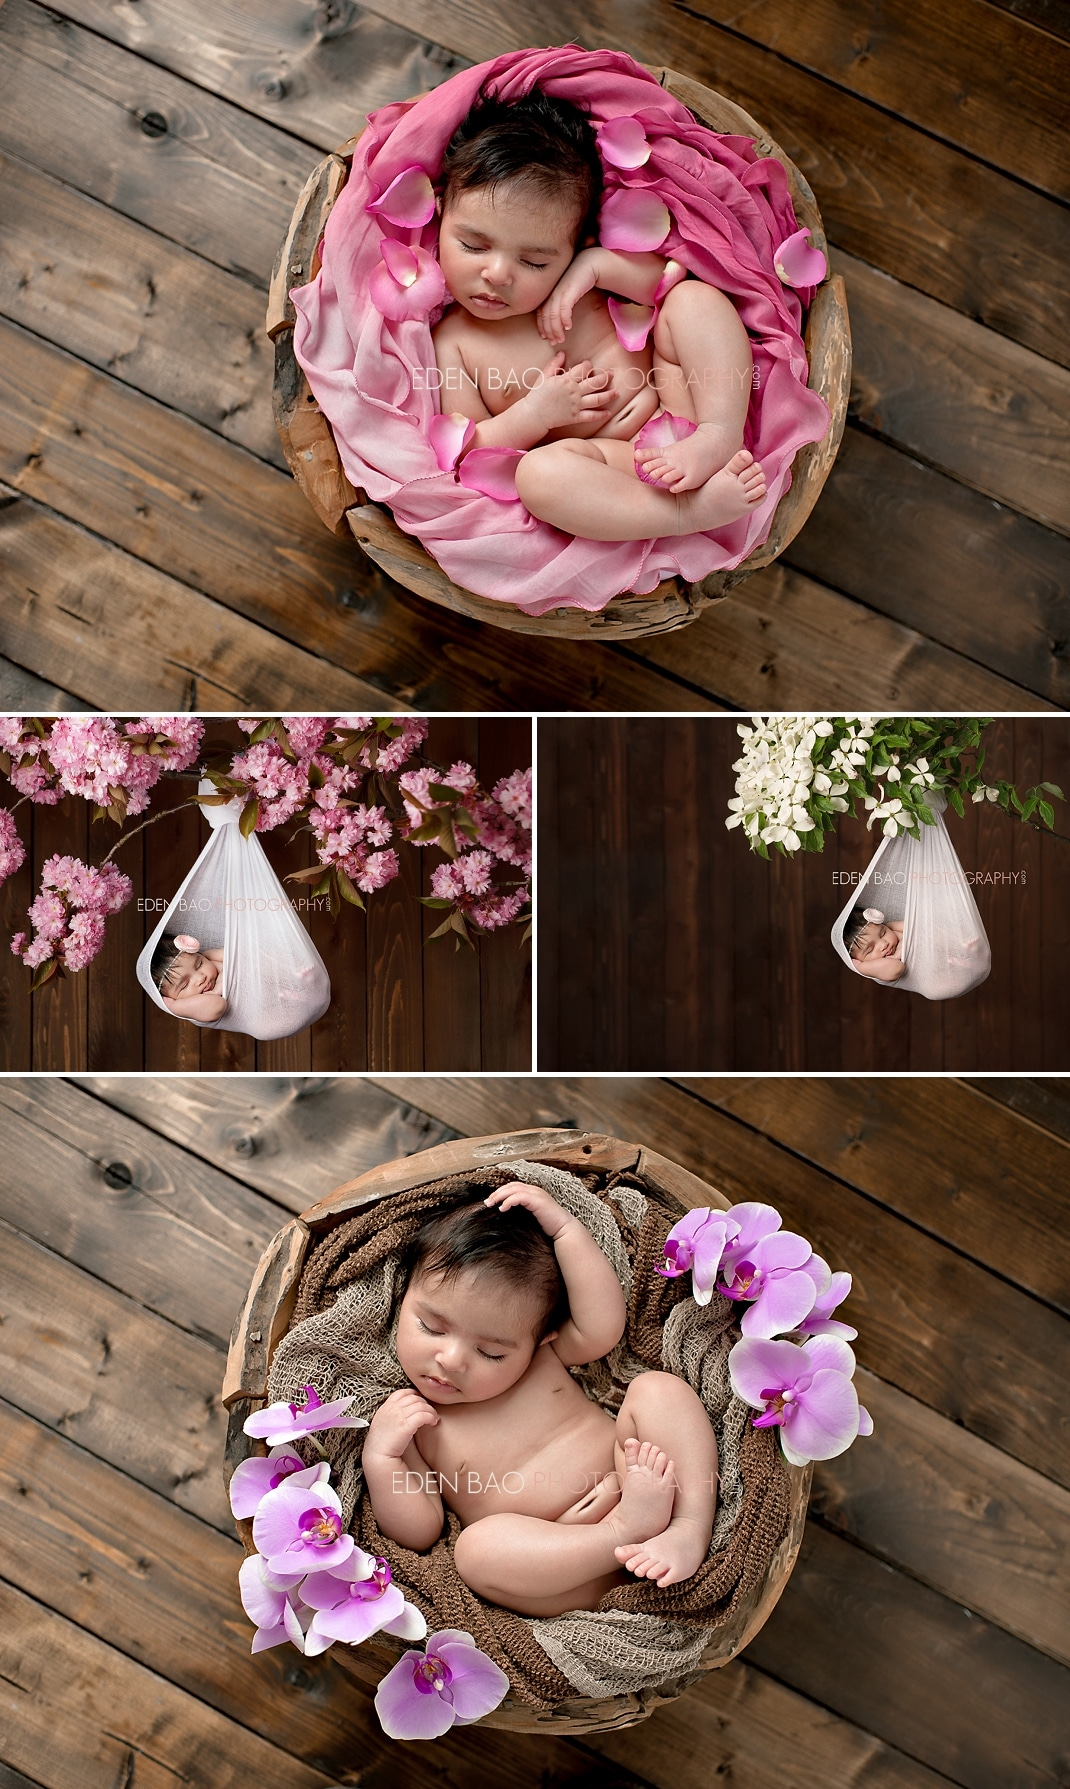 Richmond BC Newborn Photographer Eden Bao | Zara wooden bowl hanging from cherry blossom  white dogwood branch